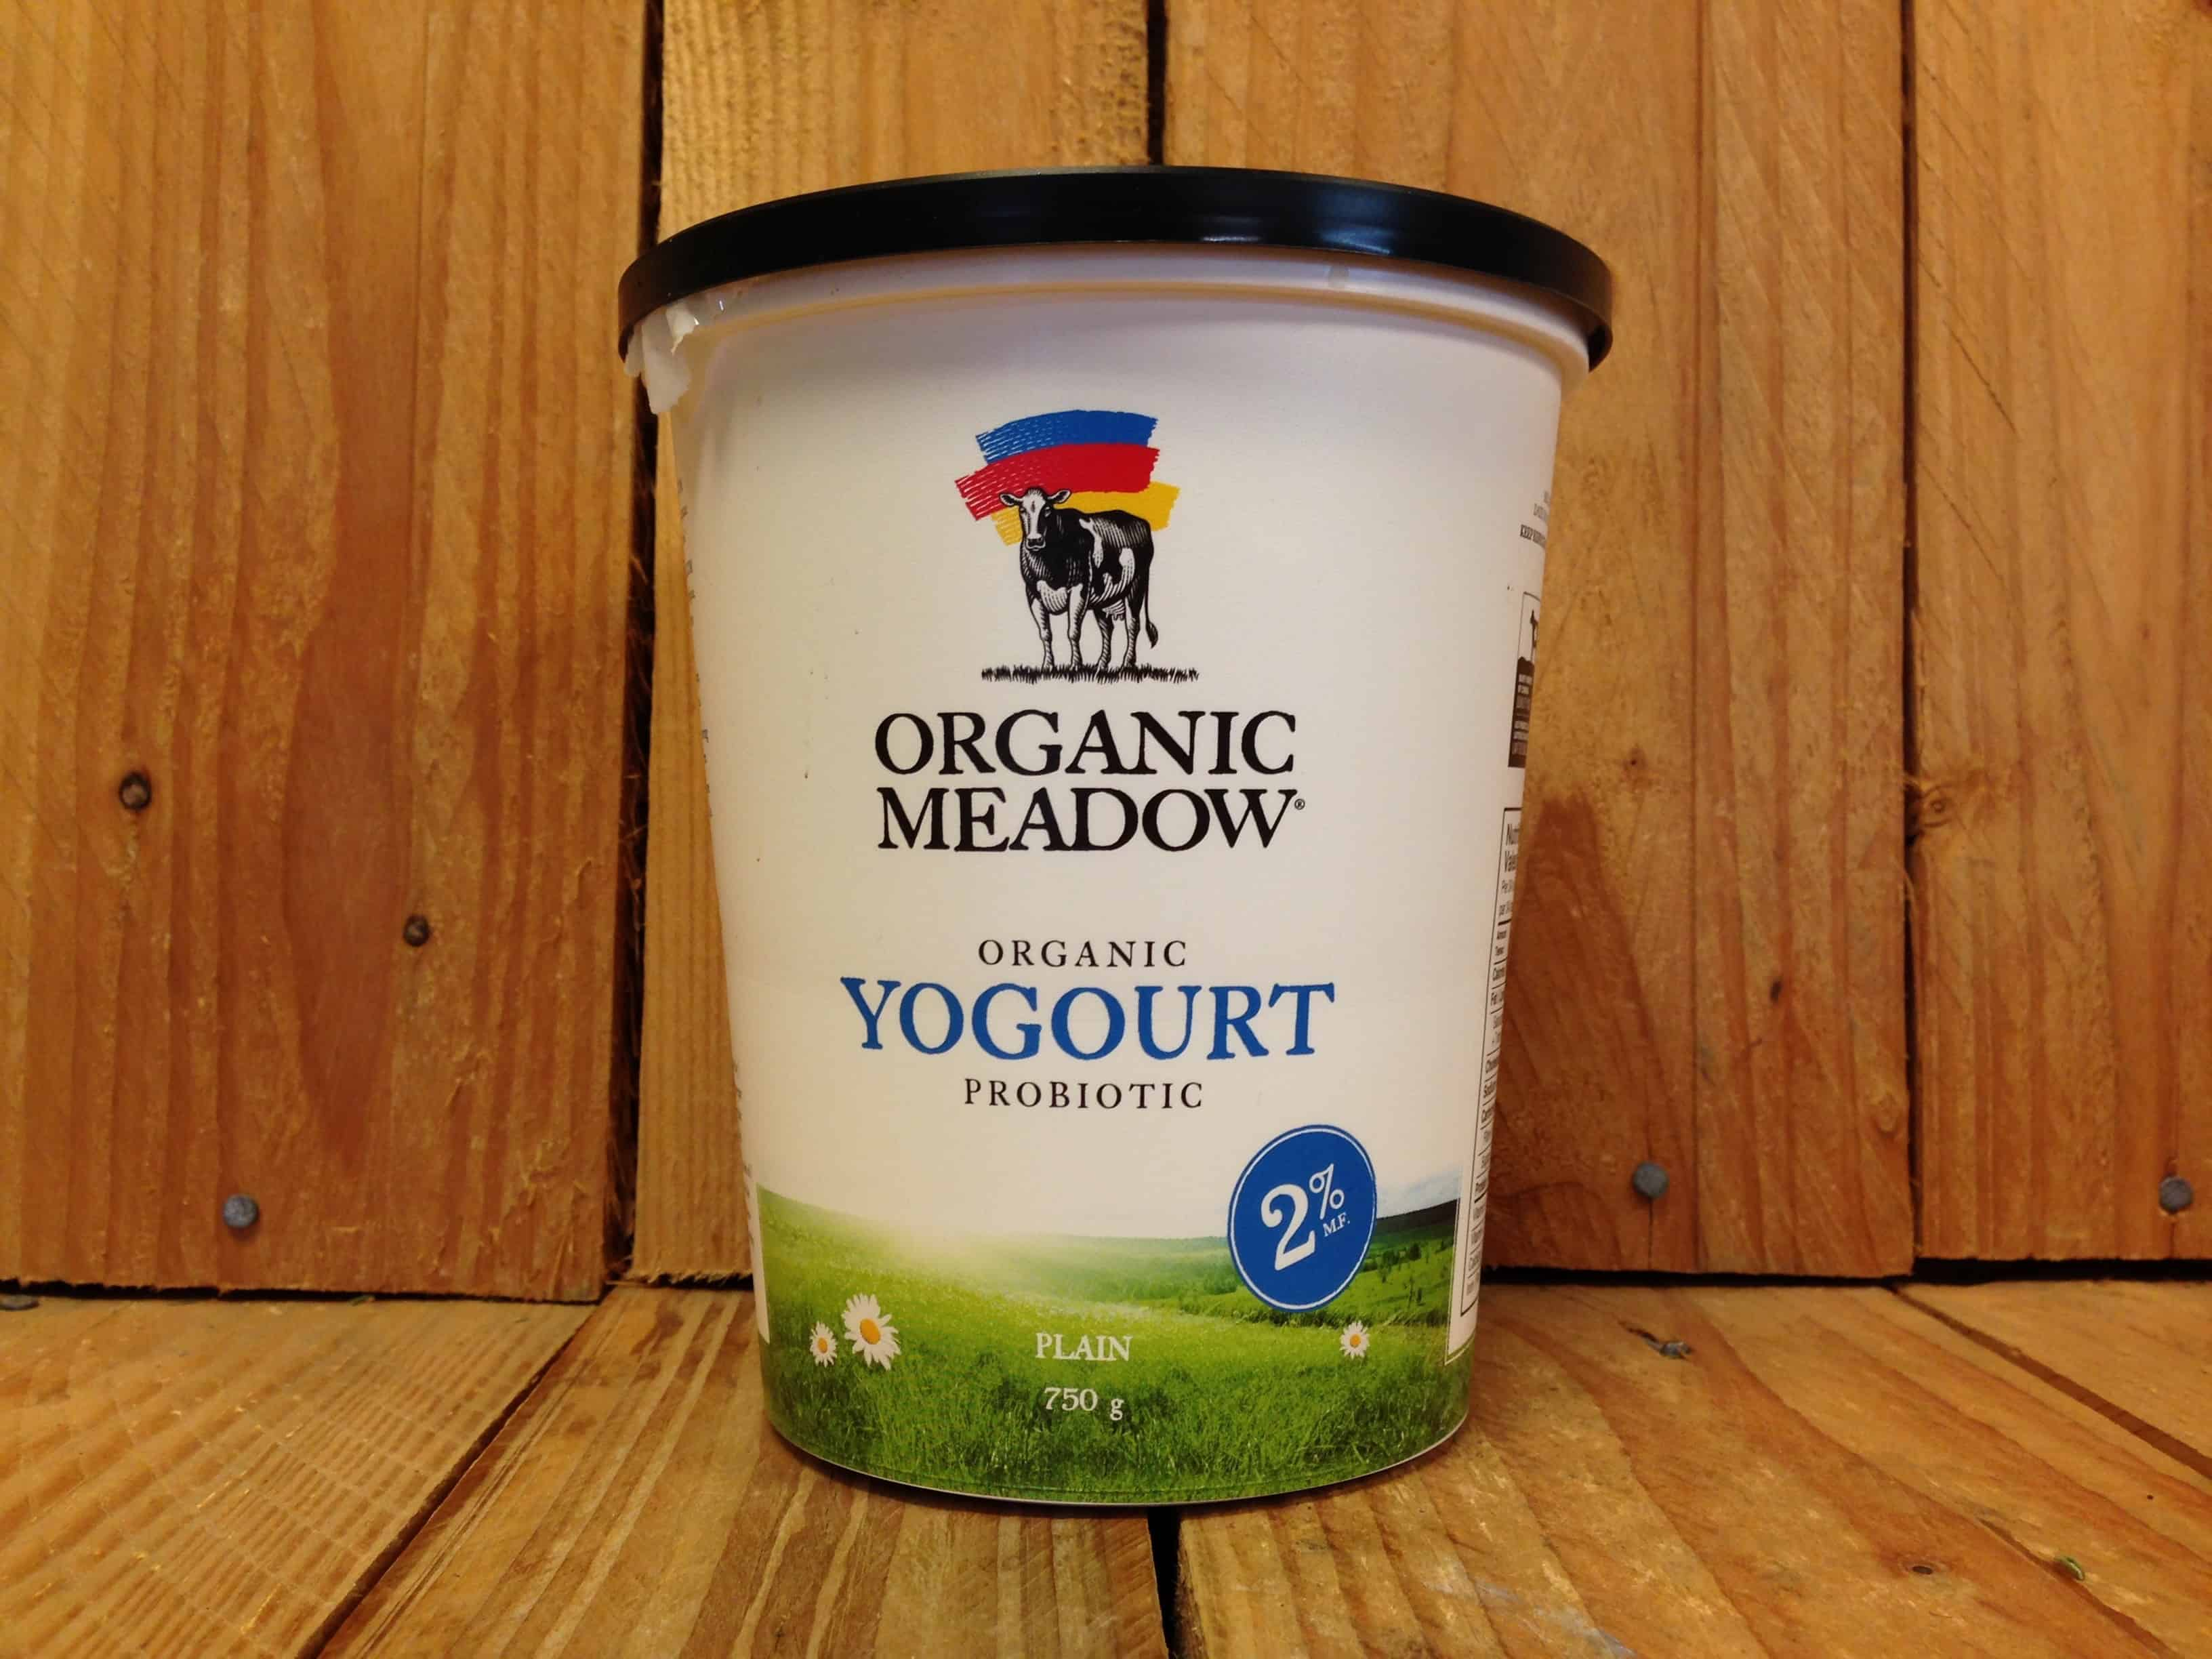 Organic Meadow – 2% Plain Yogurt (750g)